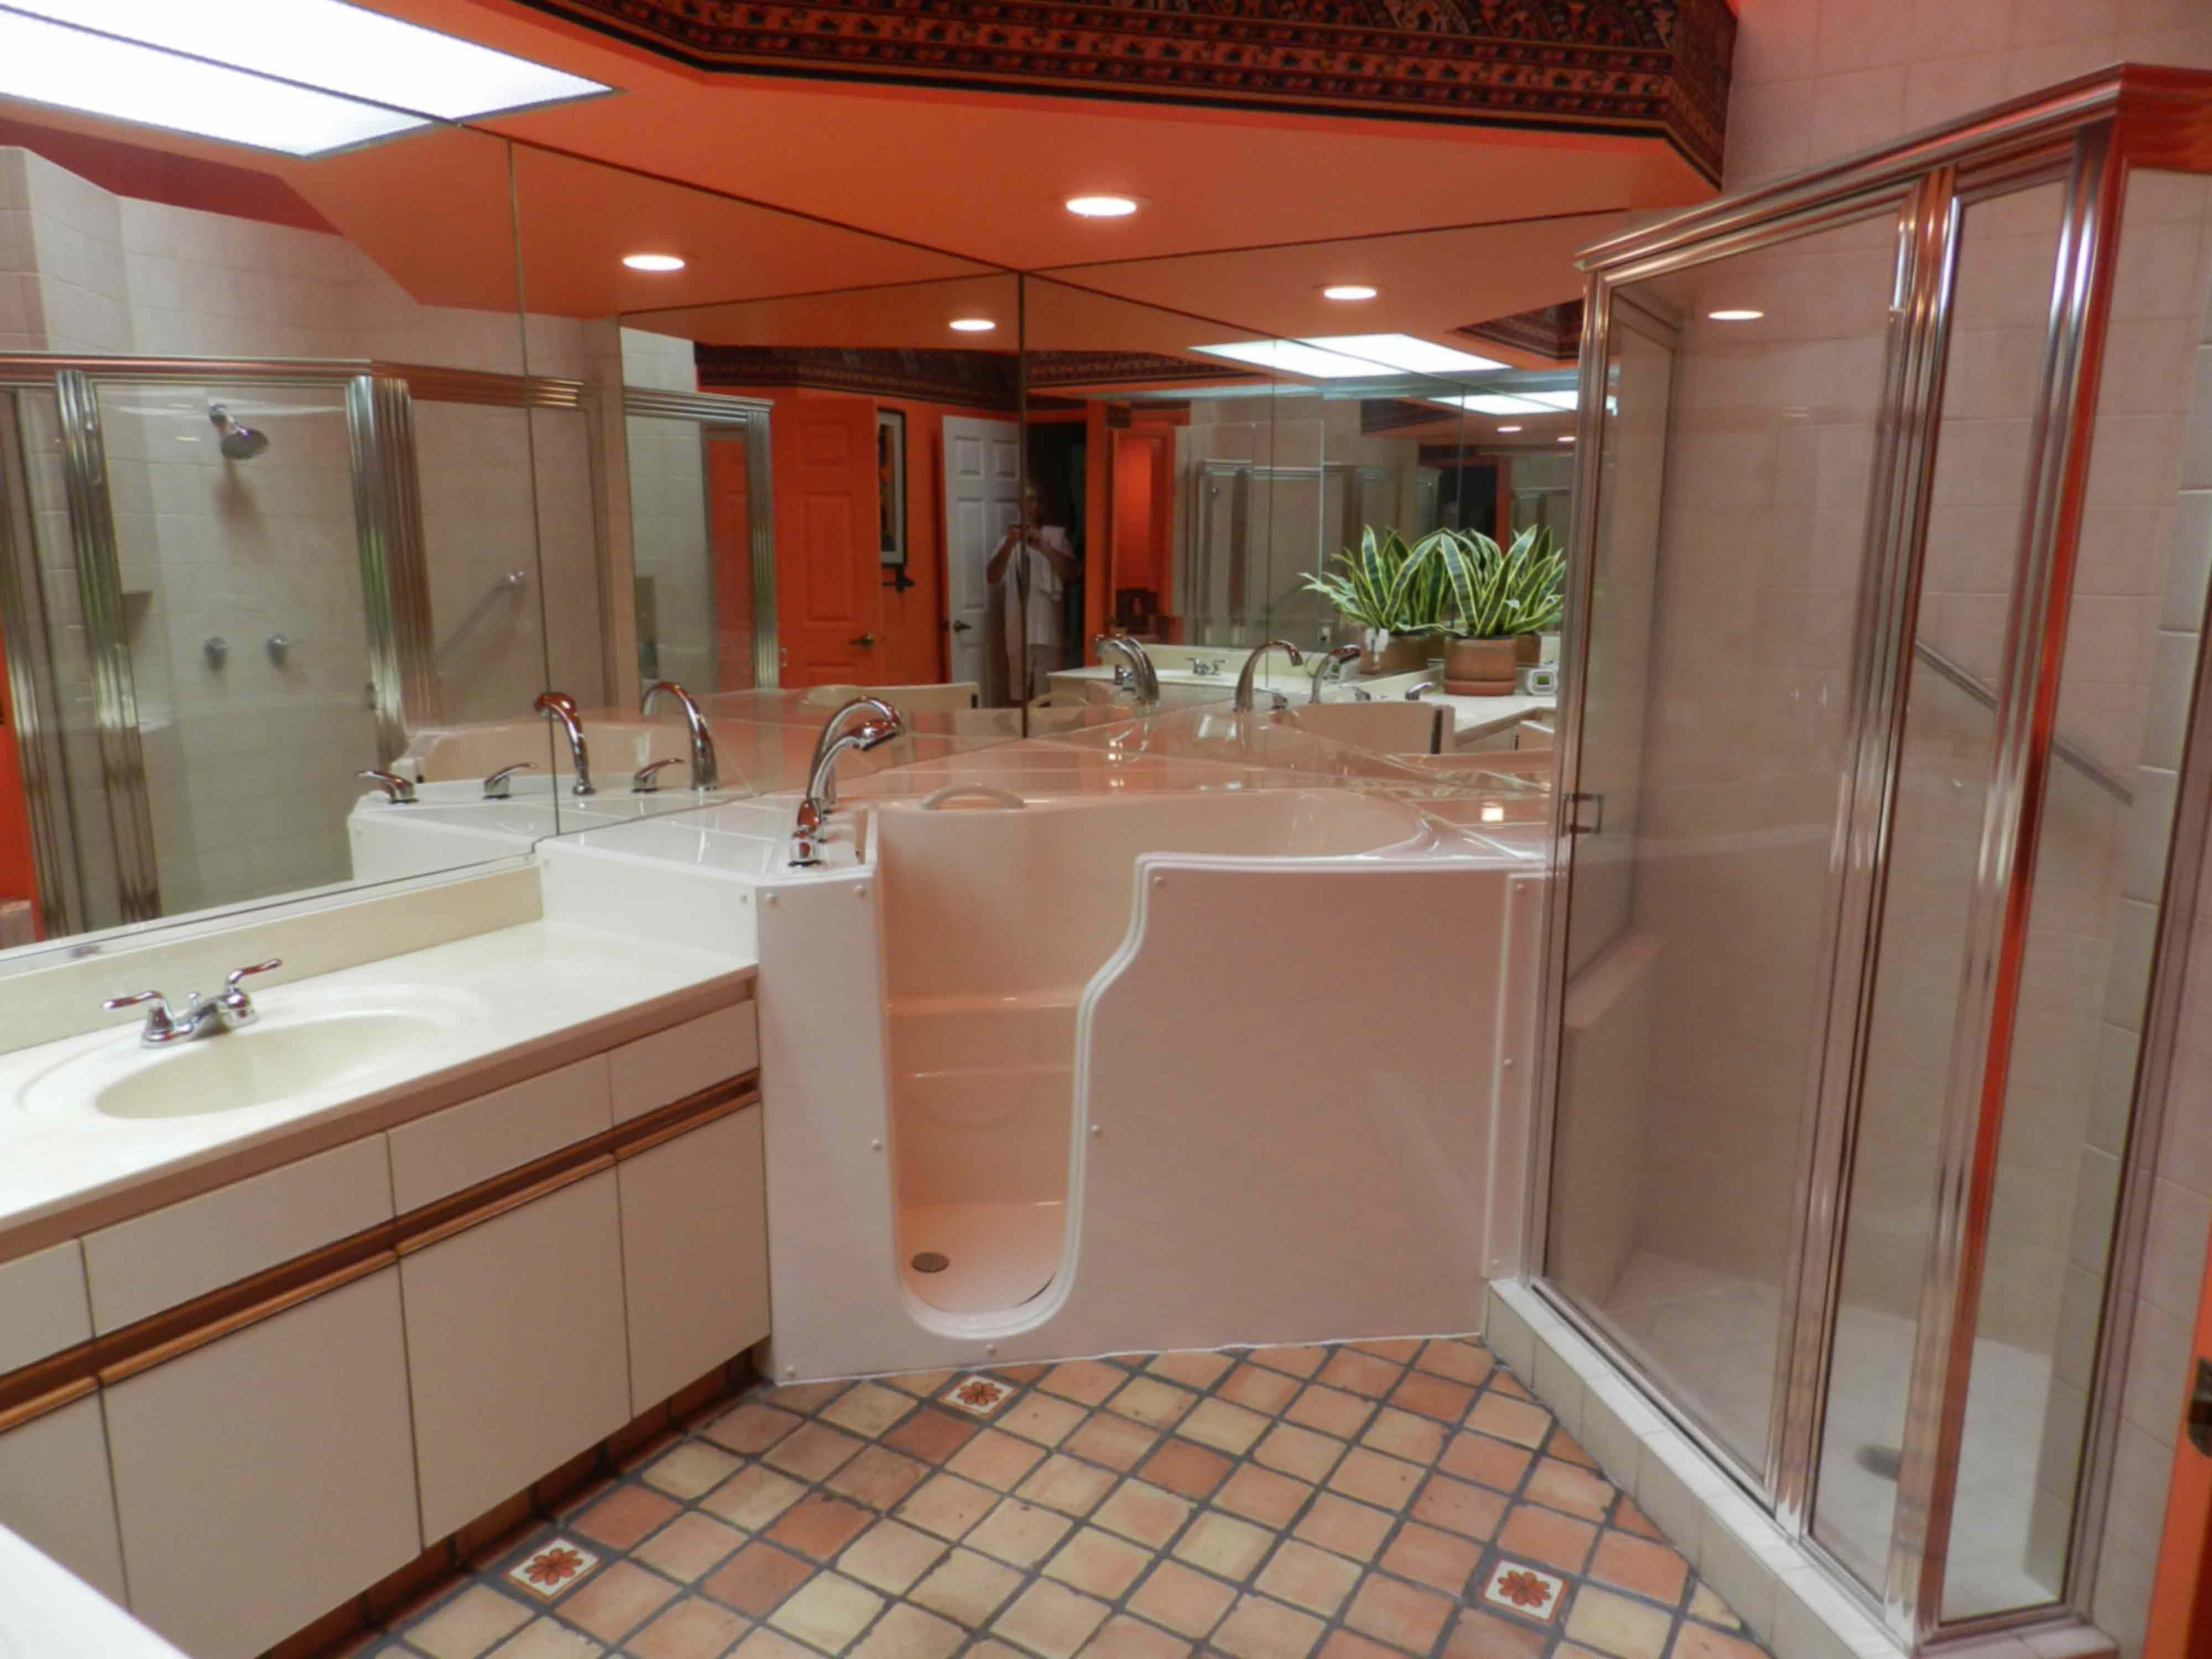 Walk Tubs For Seniors Elderly Handicap Bathtubs Bathing Bathtub Prices Premier Care Tub Walk In Showers For Seniors Bathtub Price Bathtub Cost Handicap Bathtub